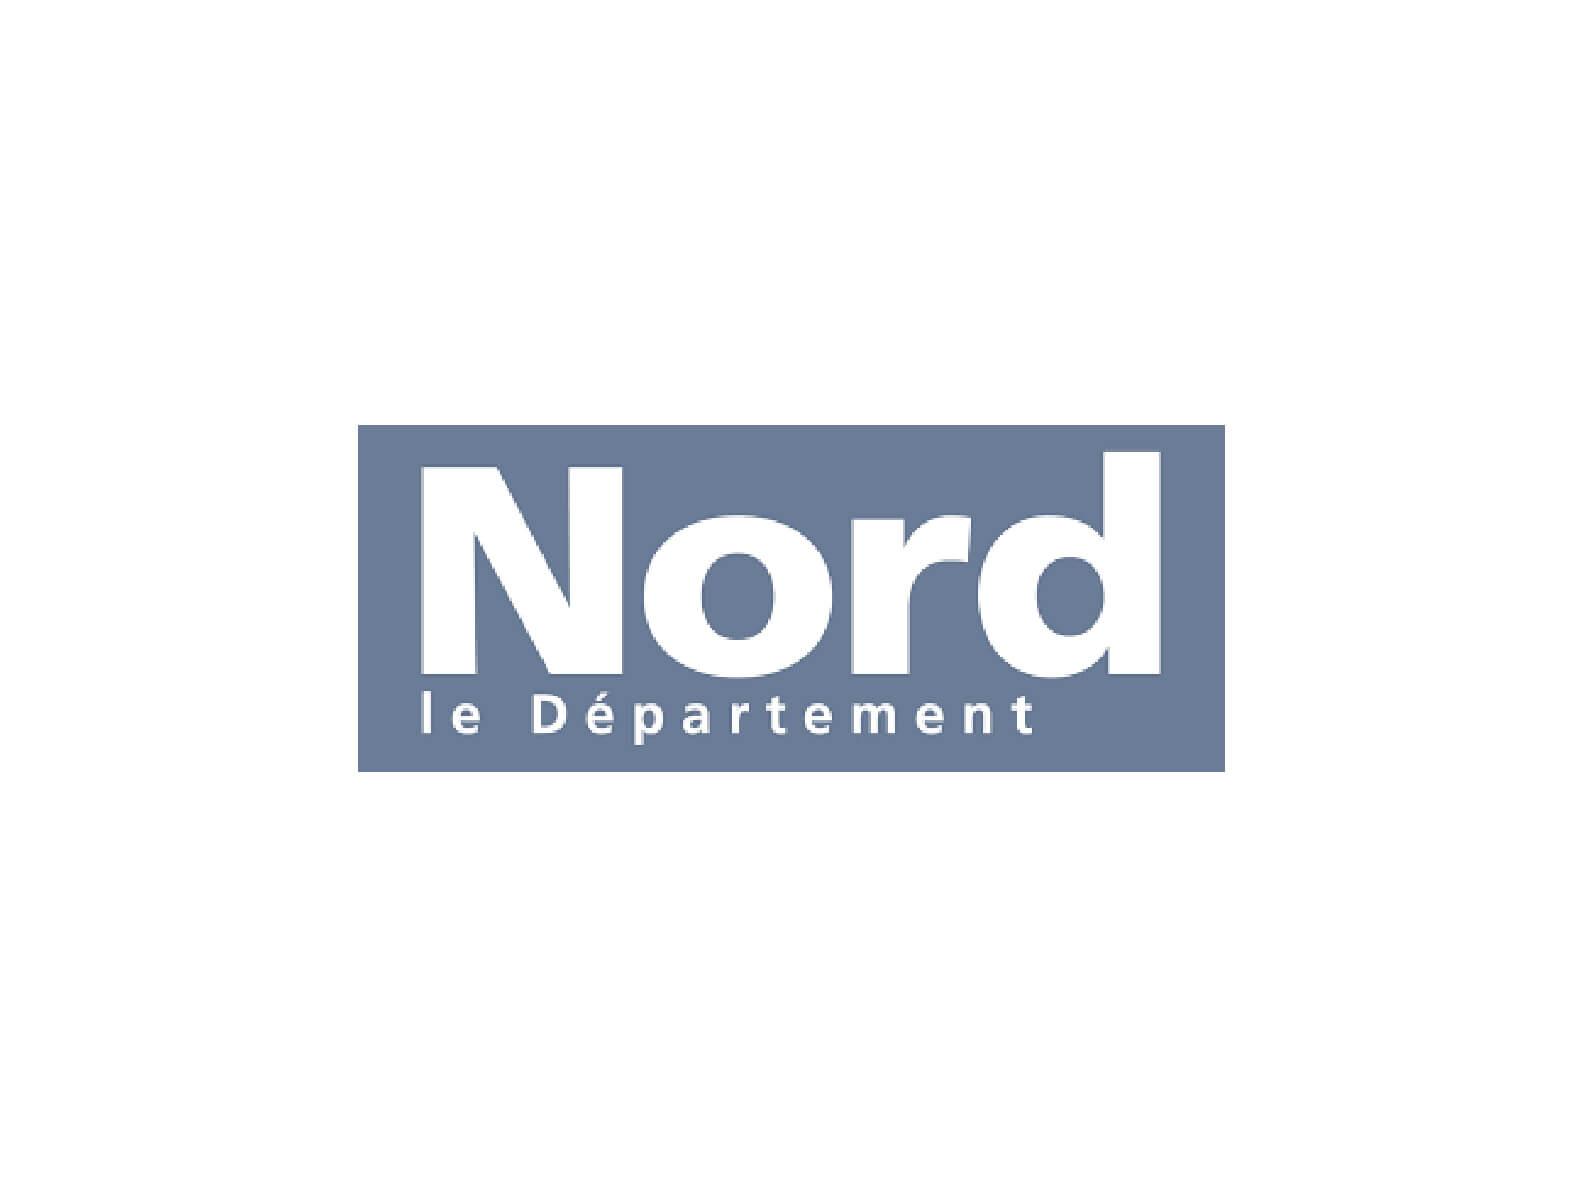 agence kayak communication web lille nord département nord logo